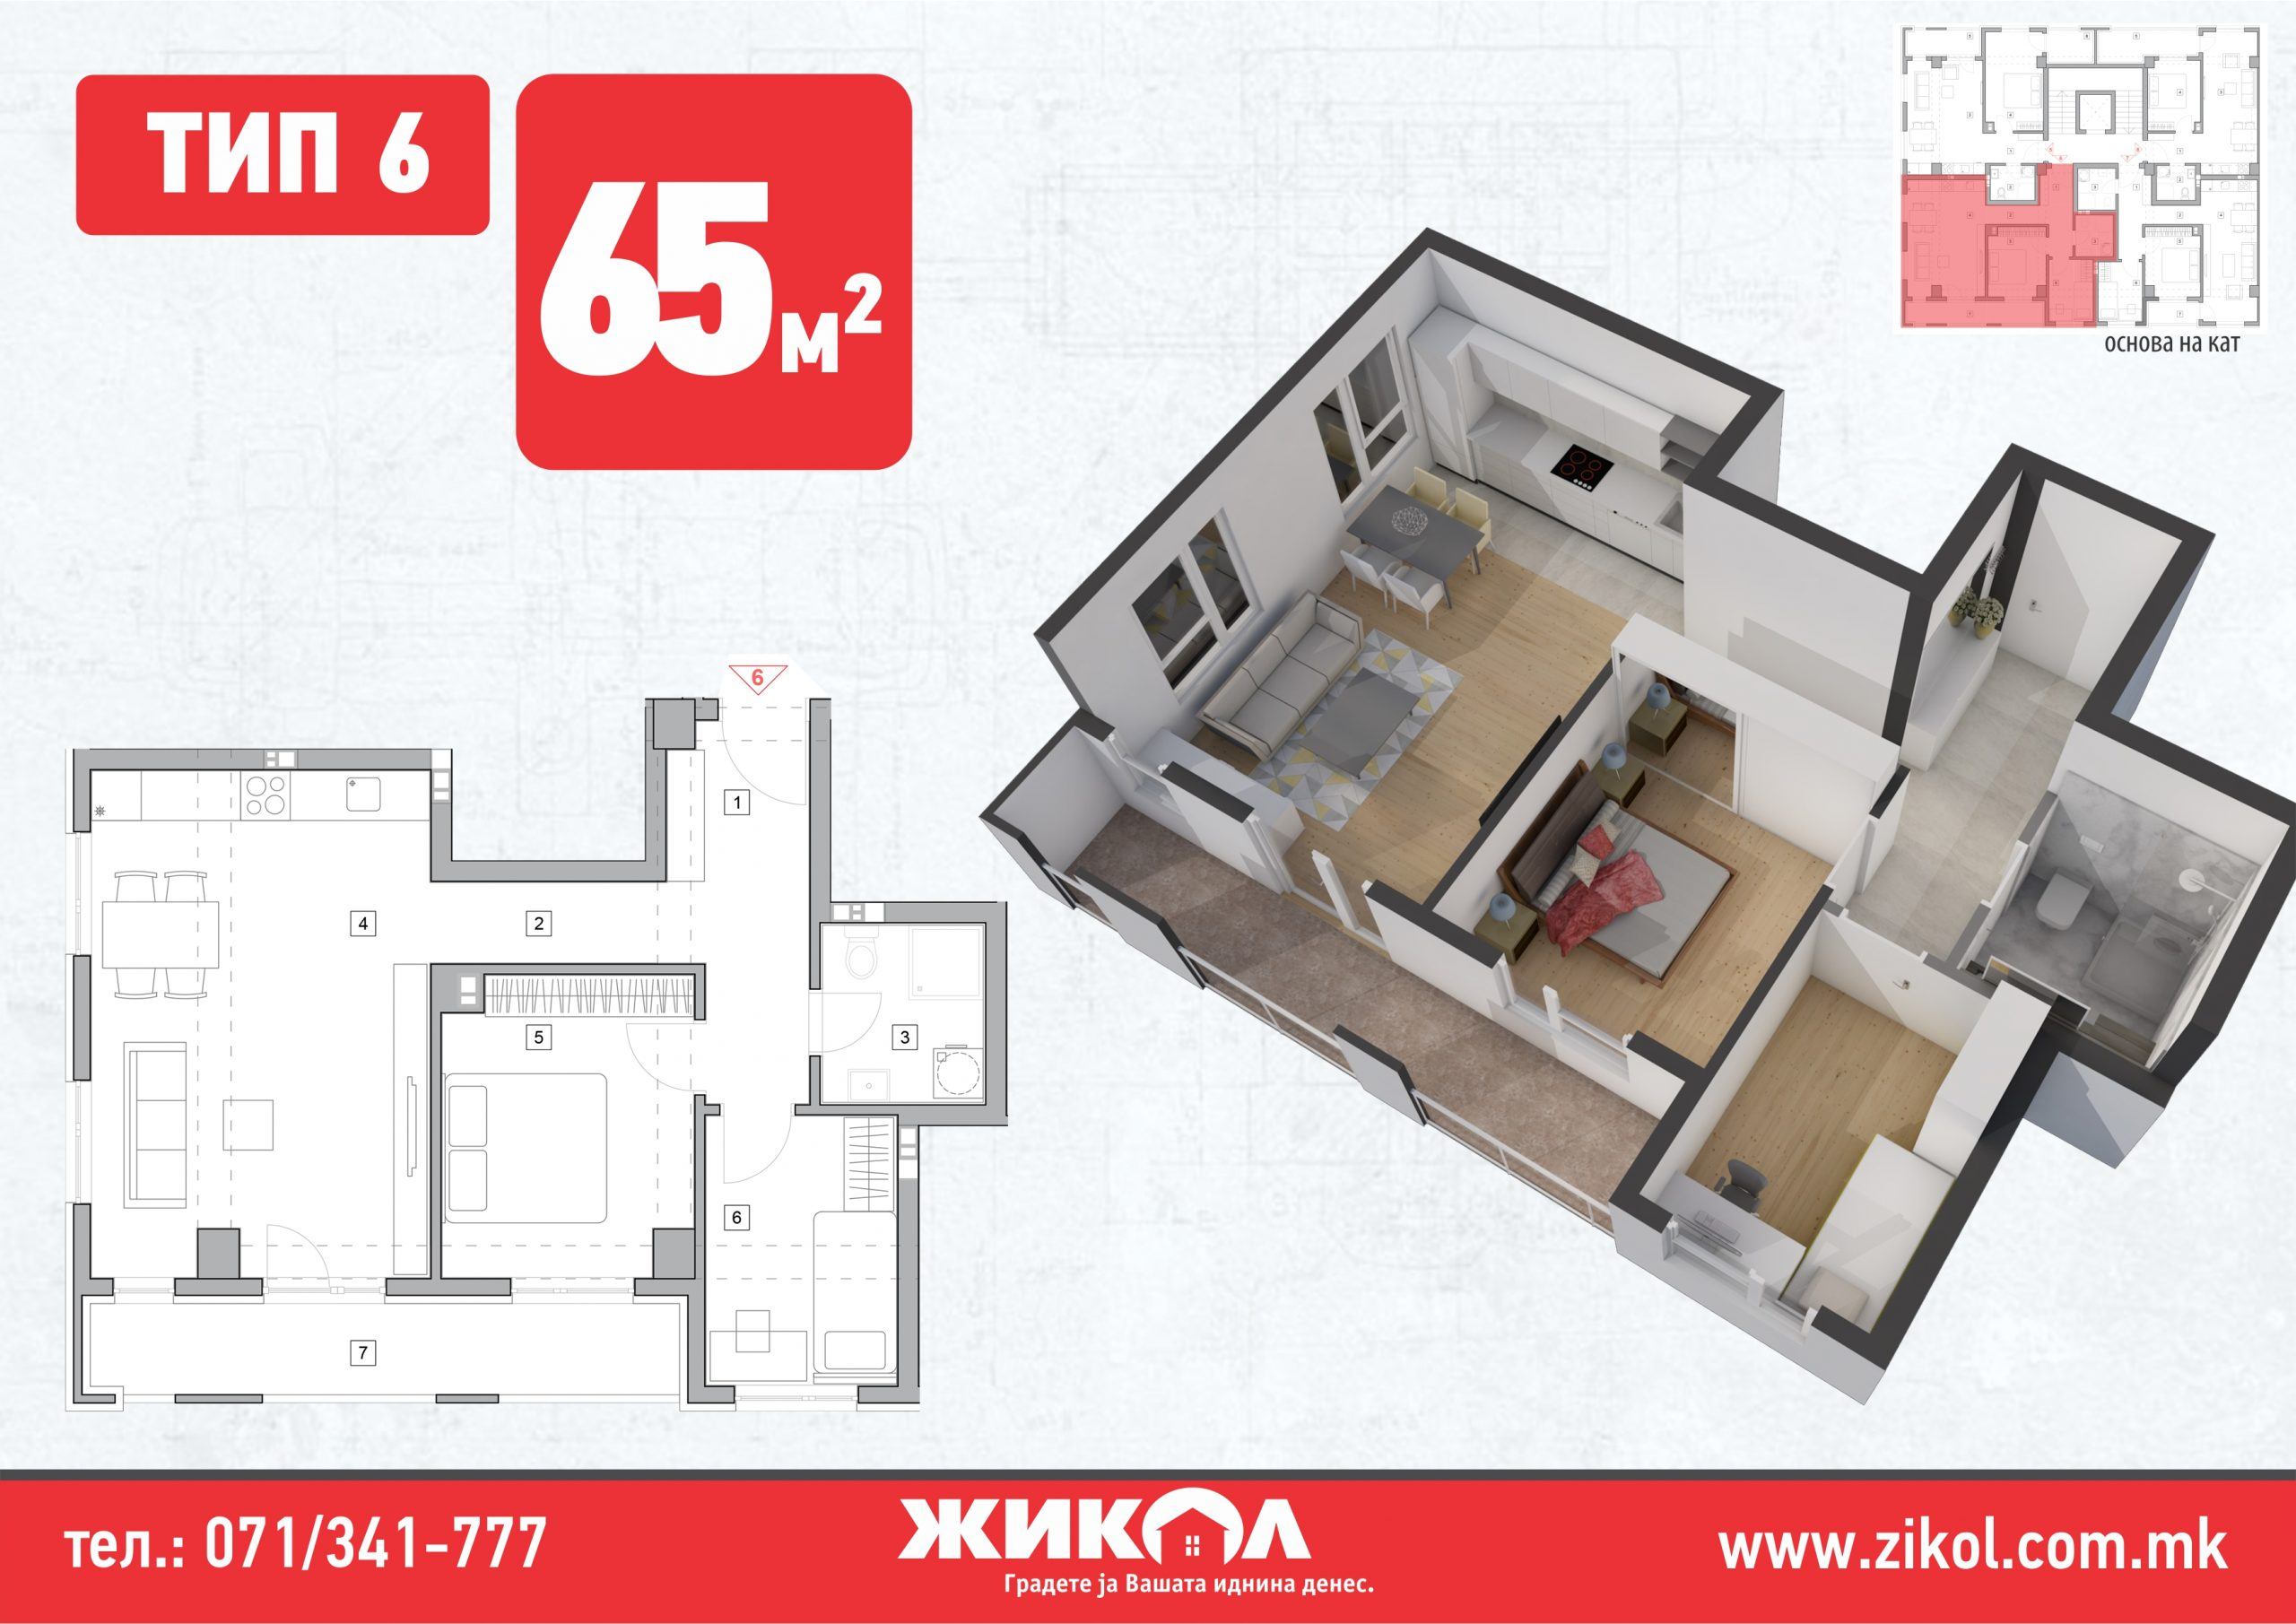 зграда 8, кат 3, стан 14